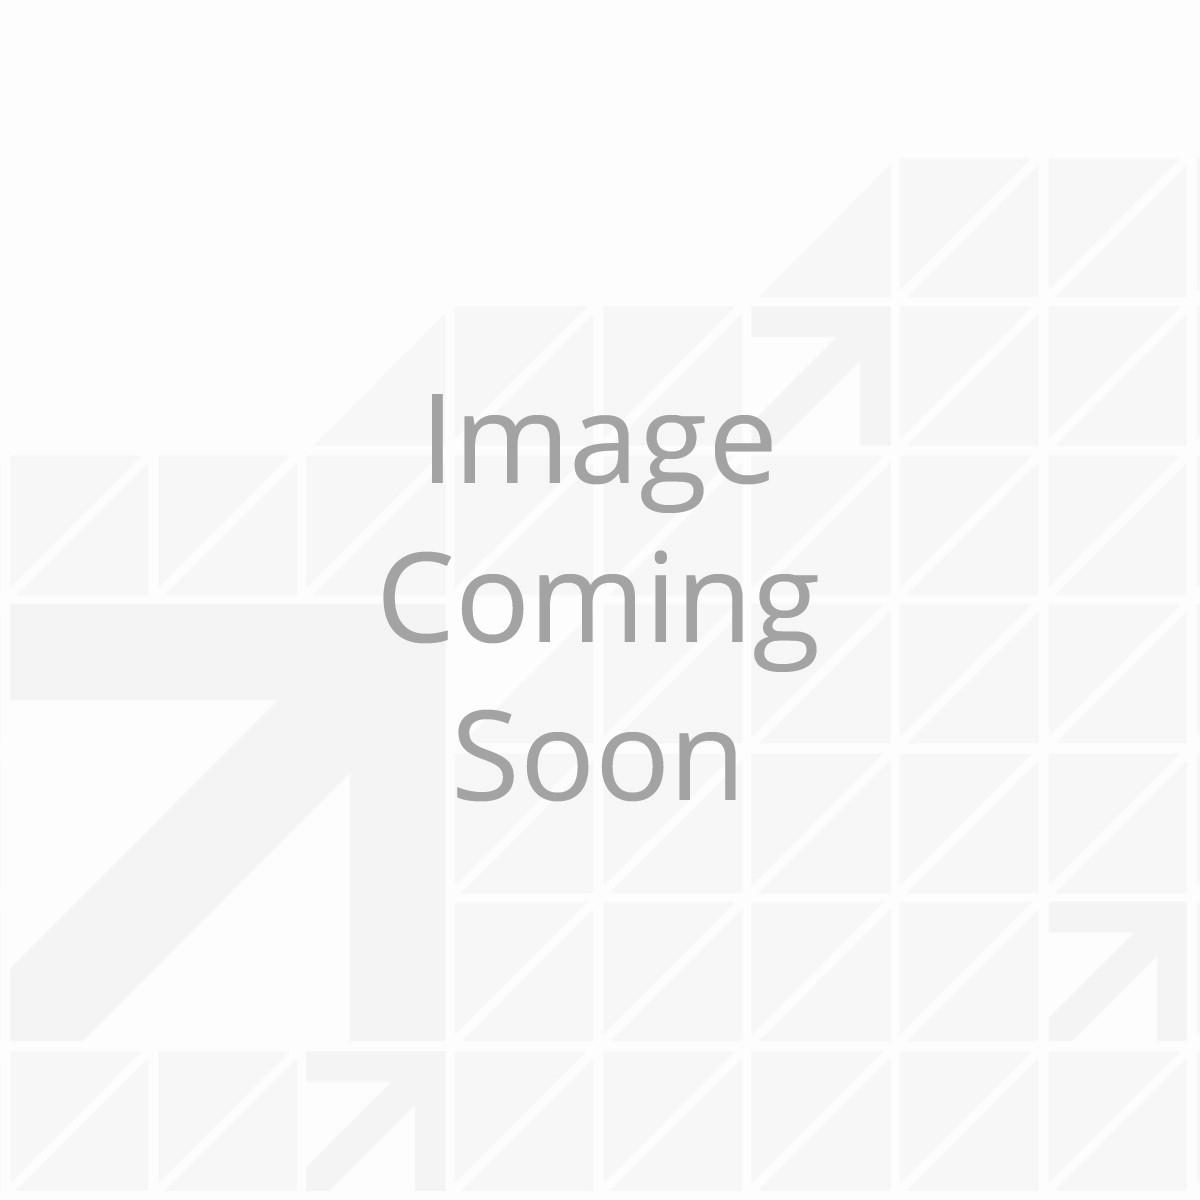 "TruTrack Trunnion Bar Weight Distribution System (8K - 10K lbs., 35-9/16"" Bars)"